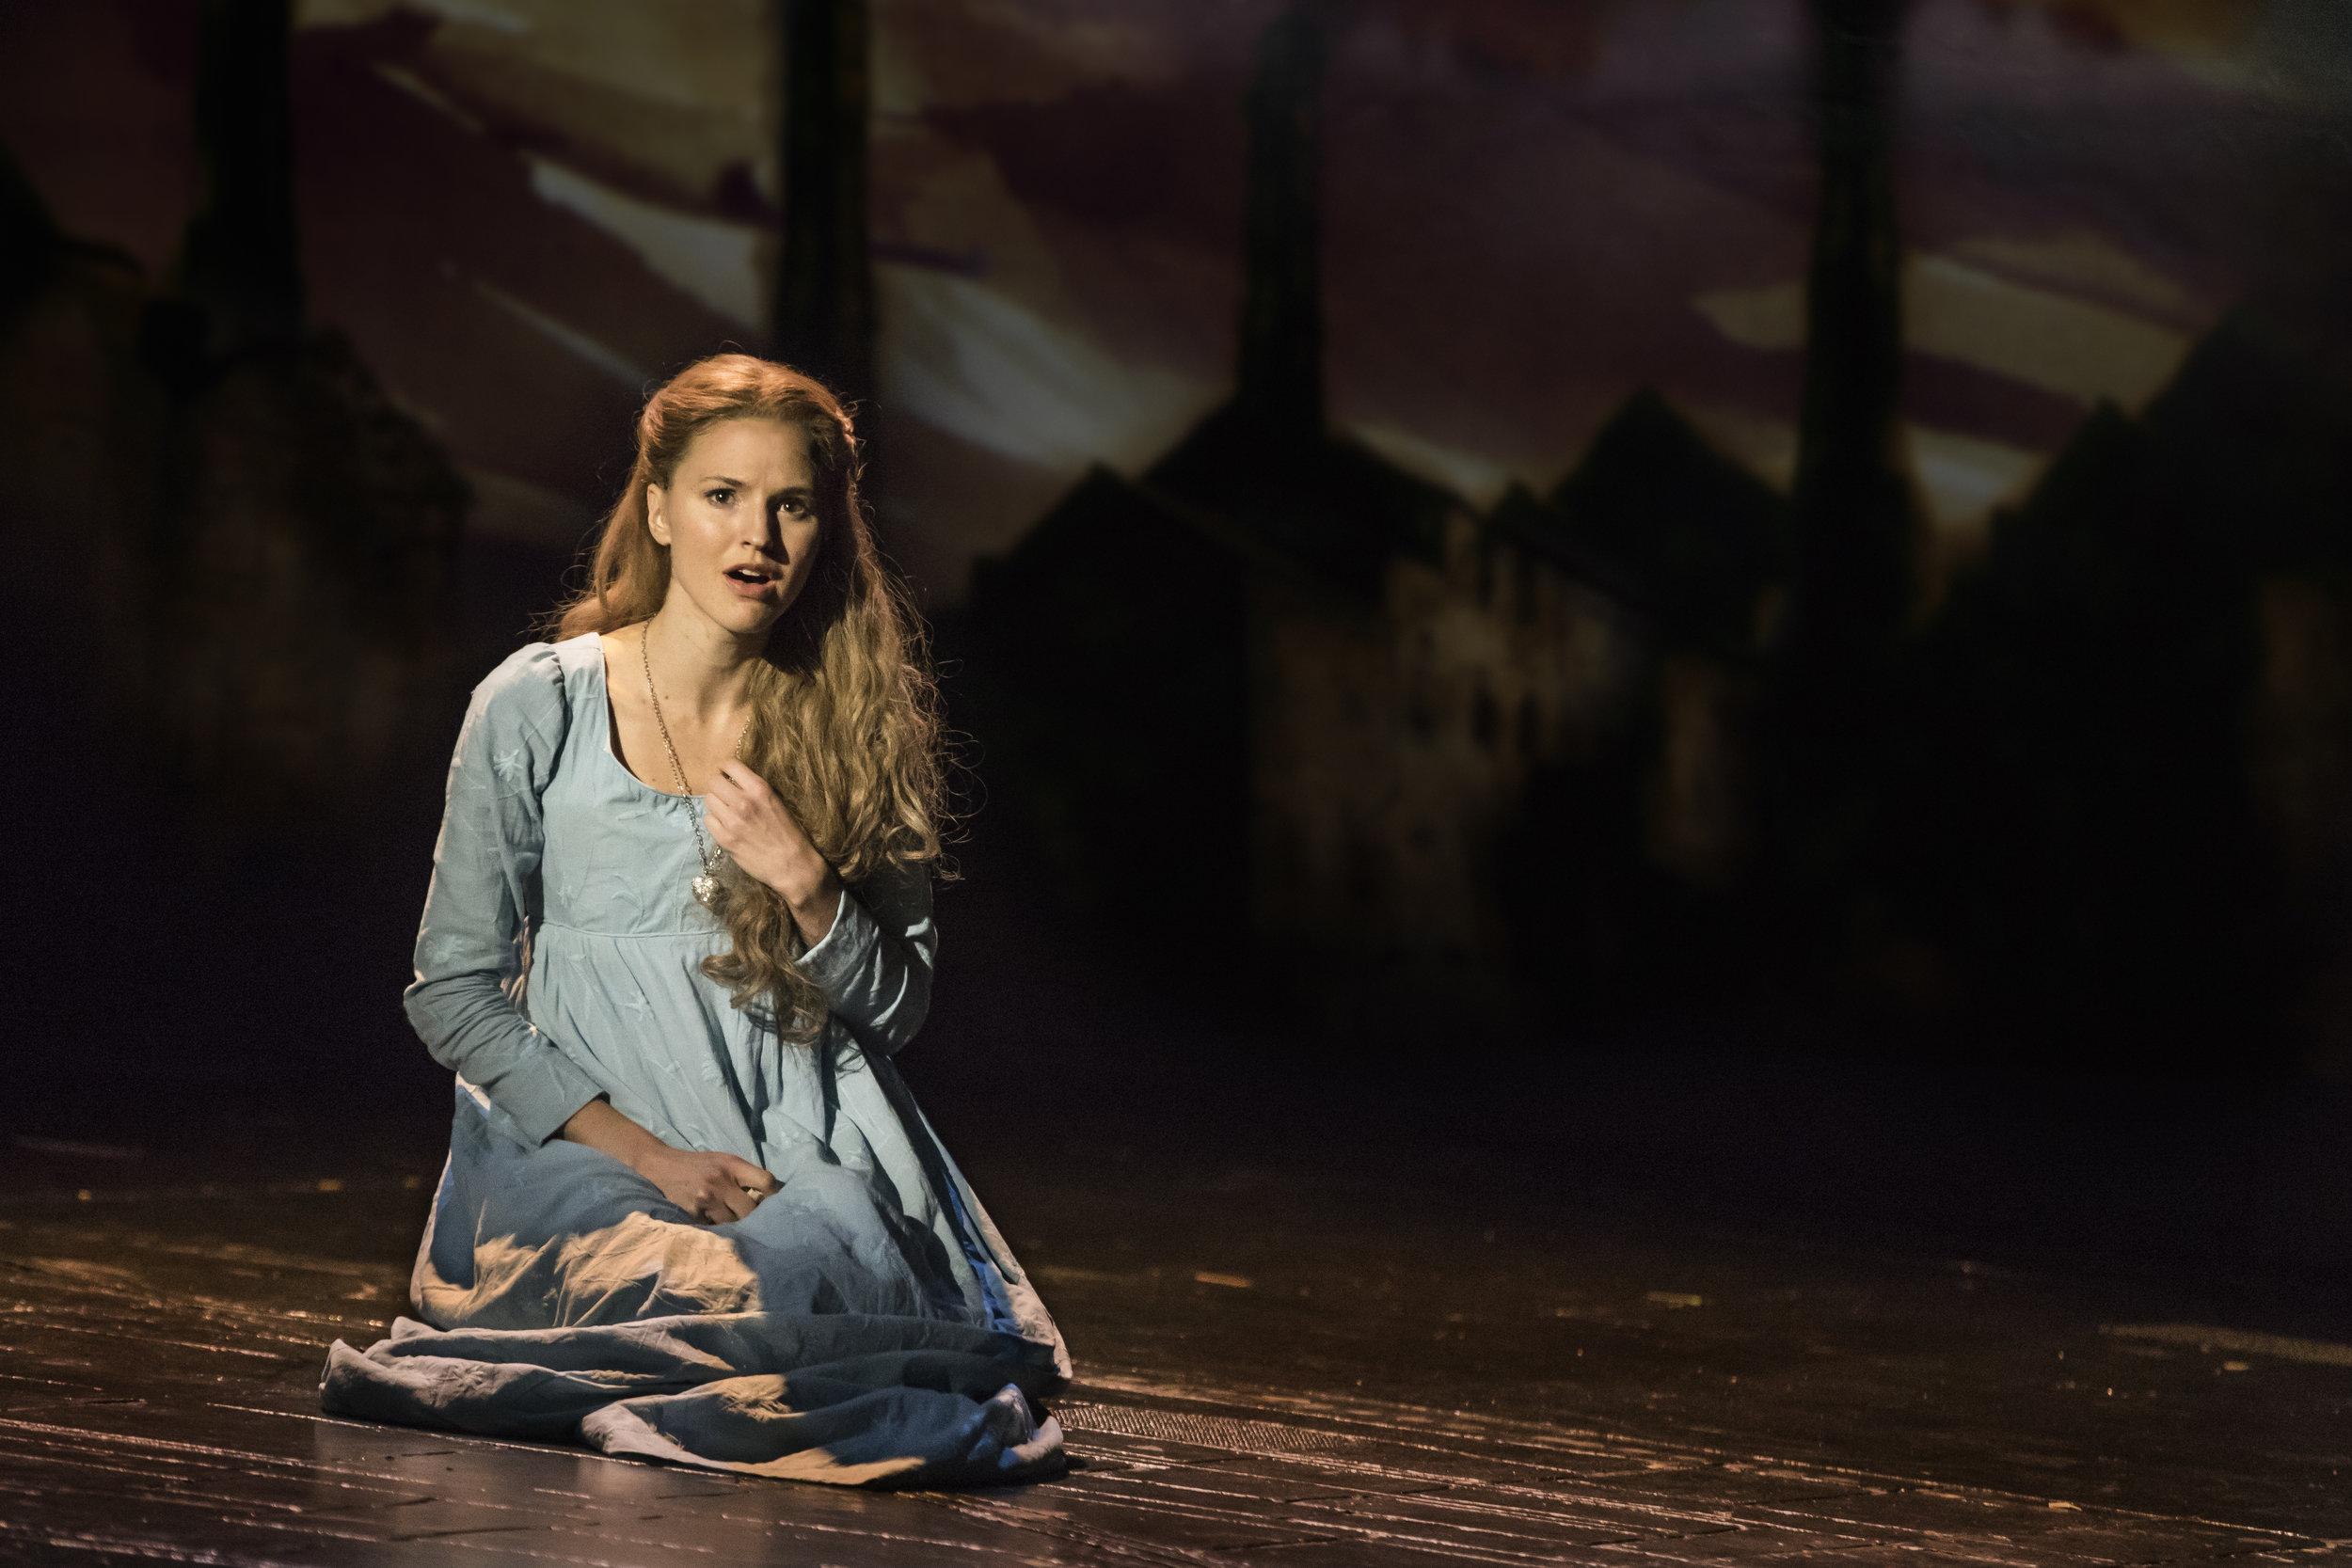 08_LM_TOUR_3974_Melissa Mitchell as Fantine.jpg